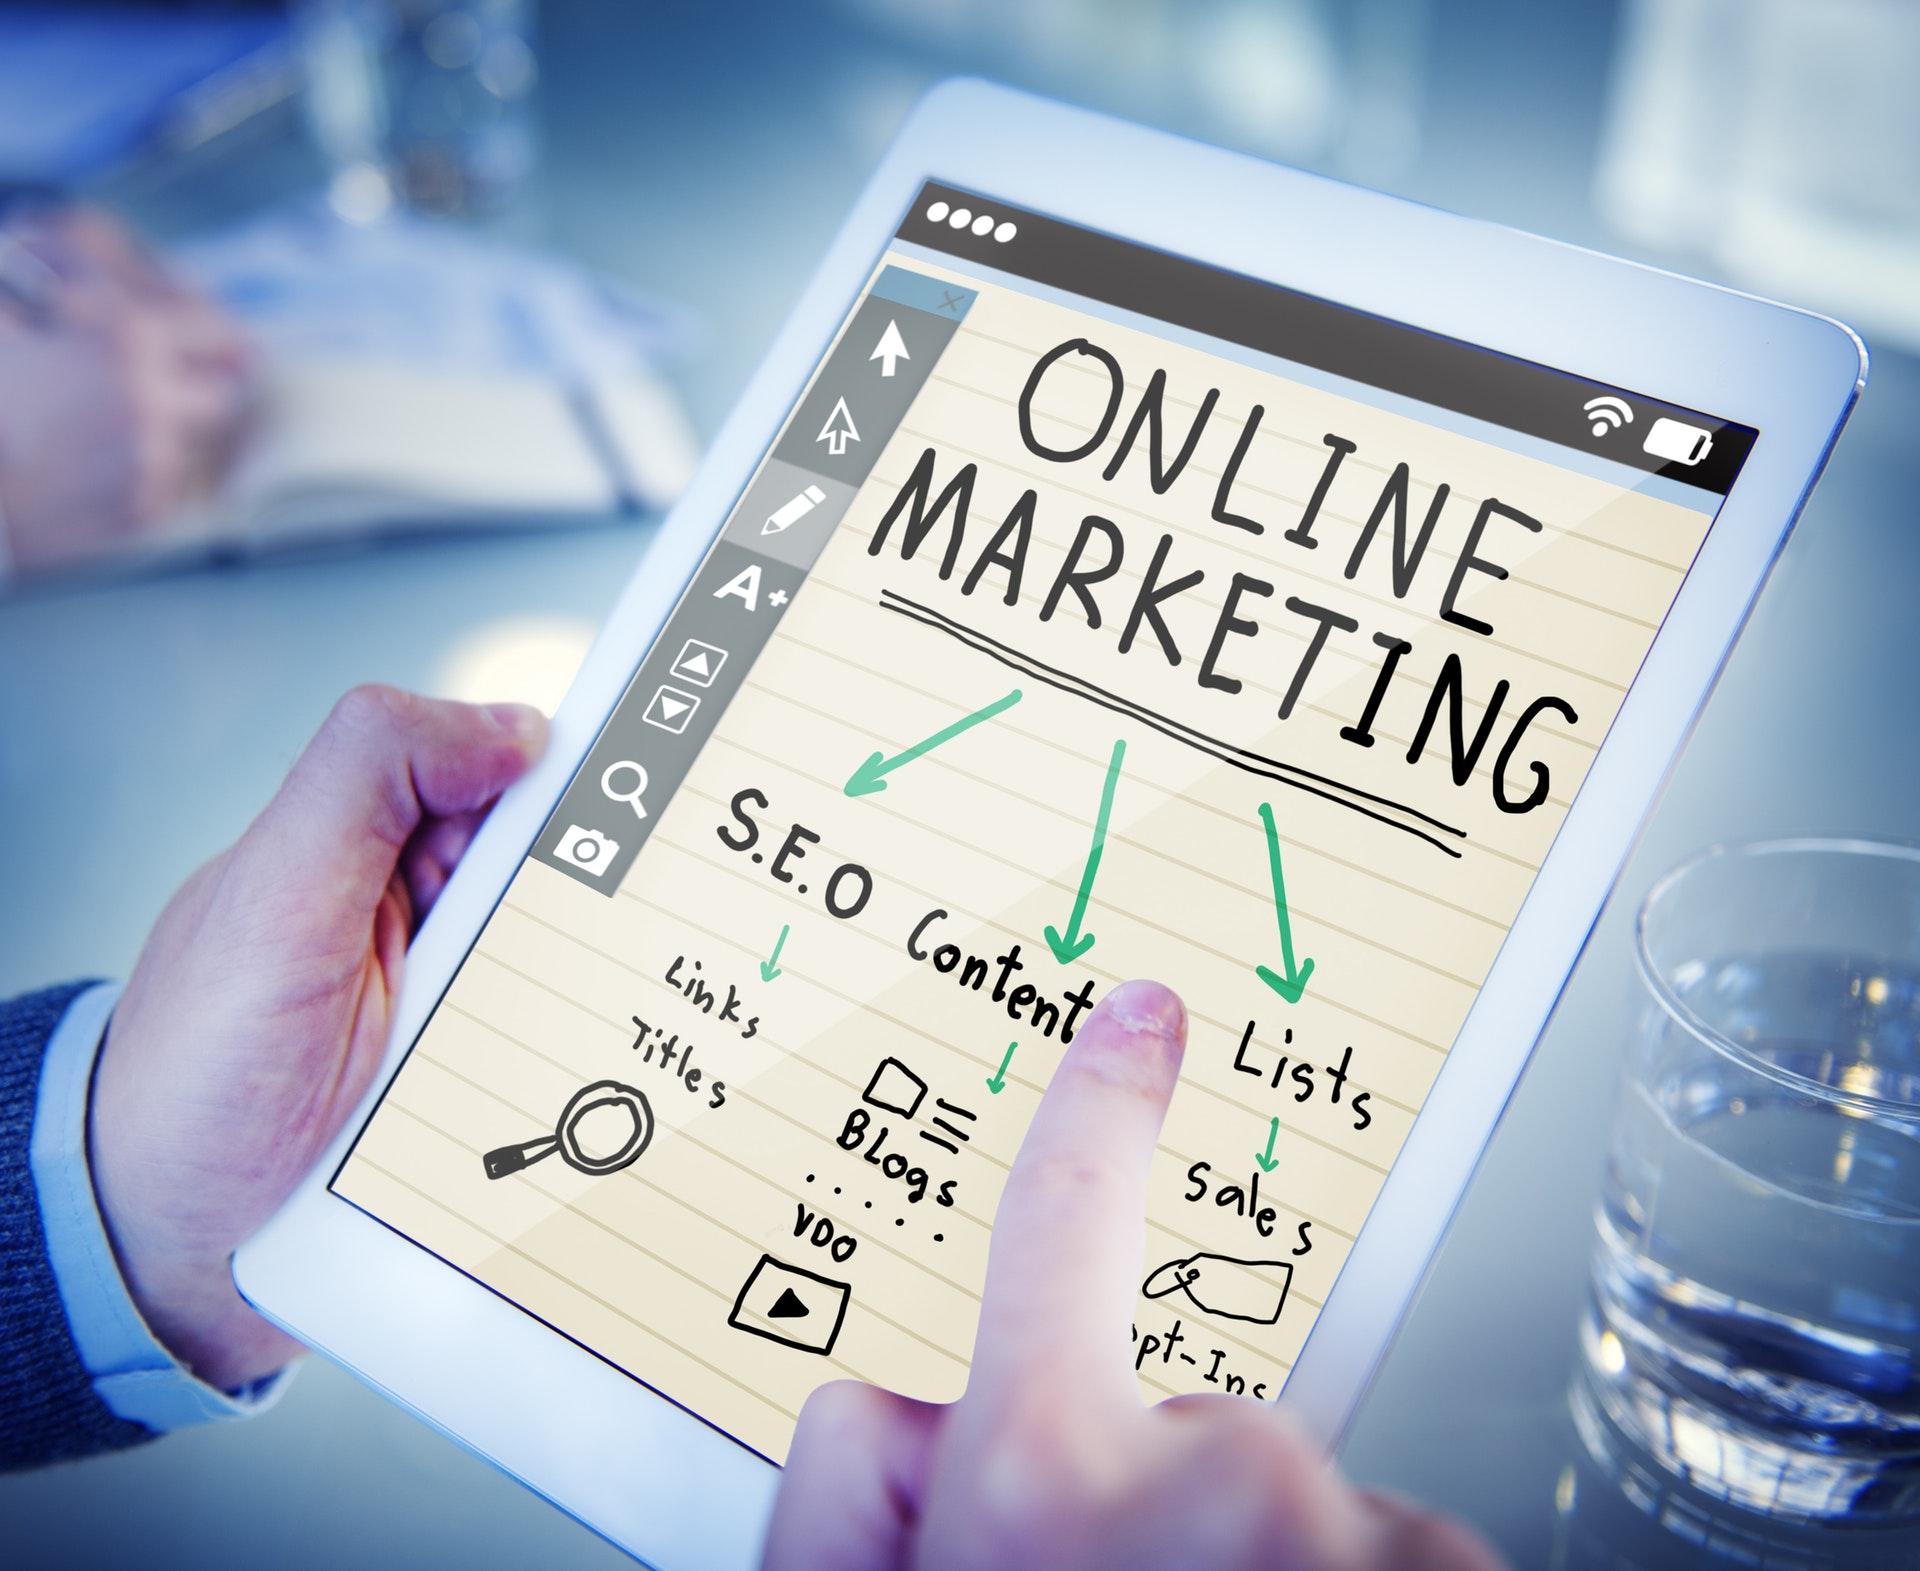 B2B content marketing challenges pexels-photo-266176